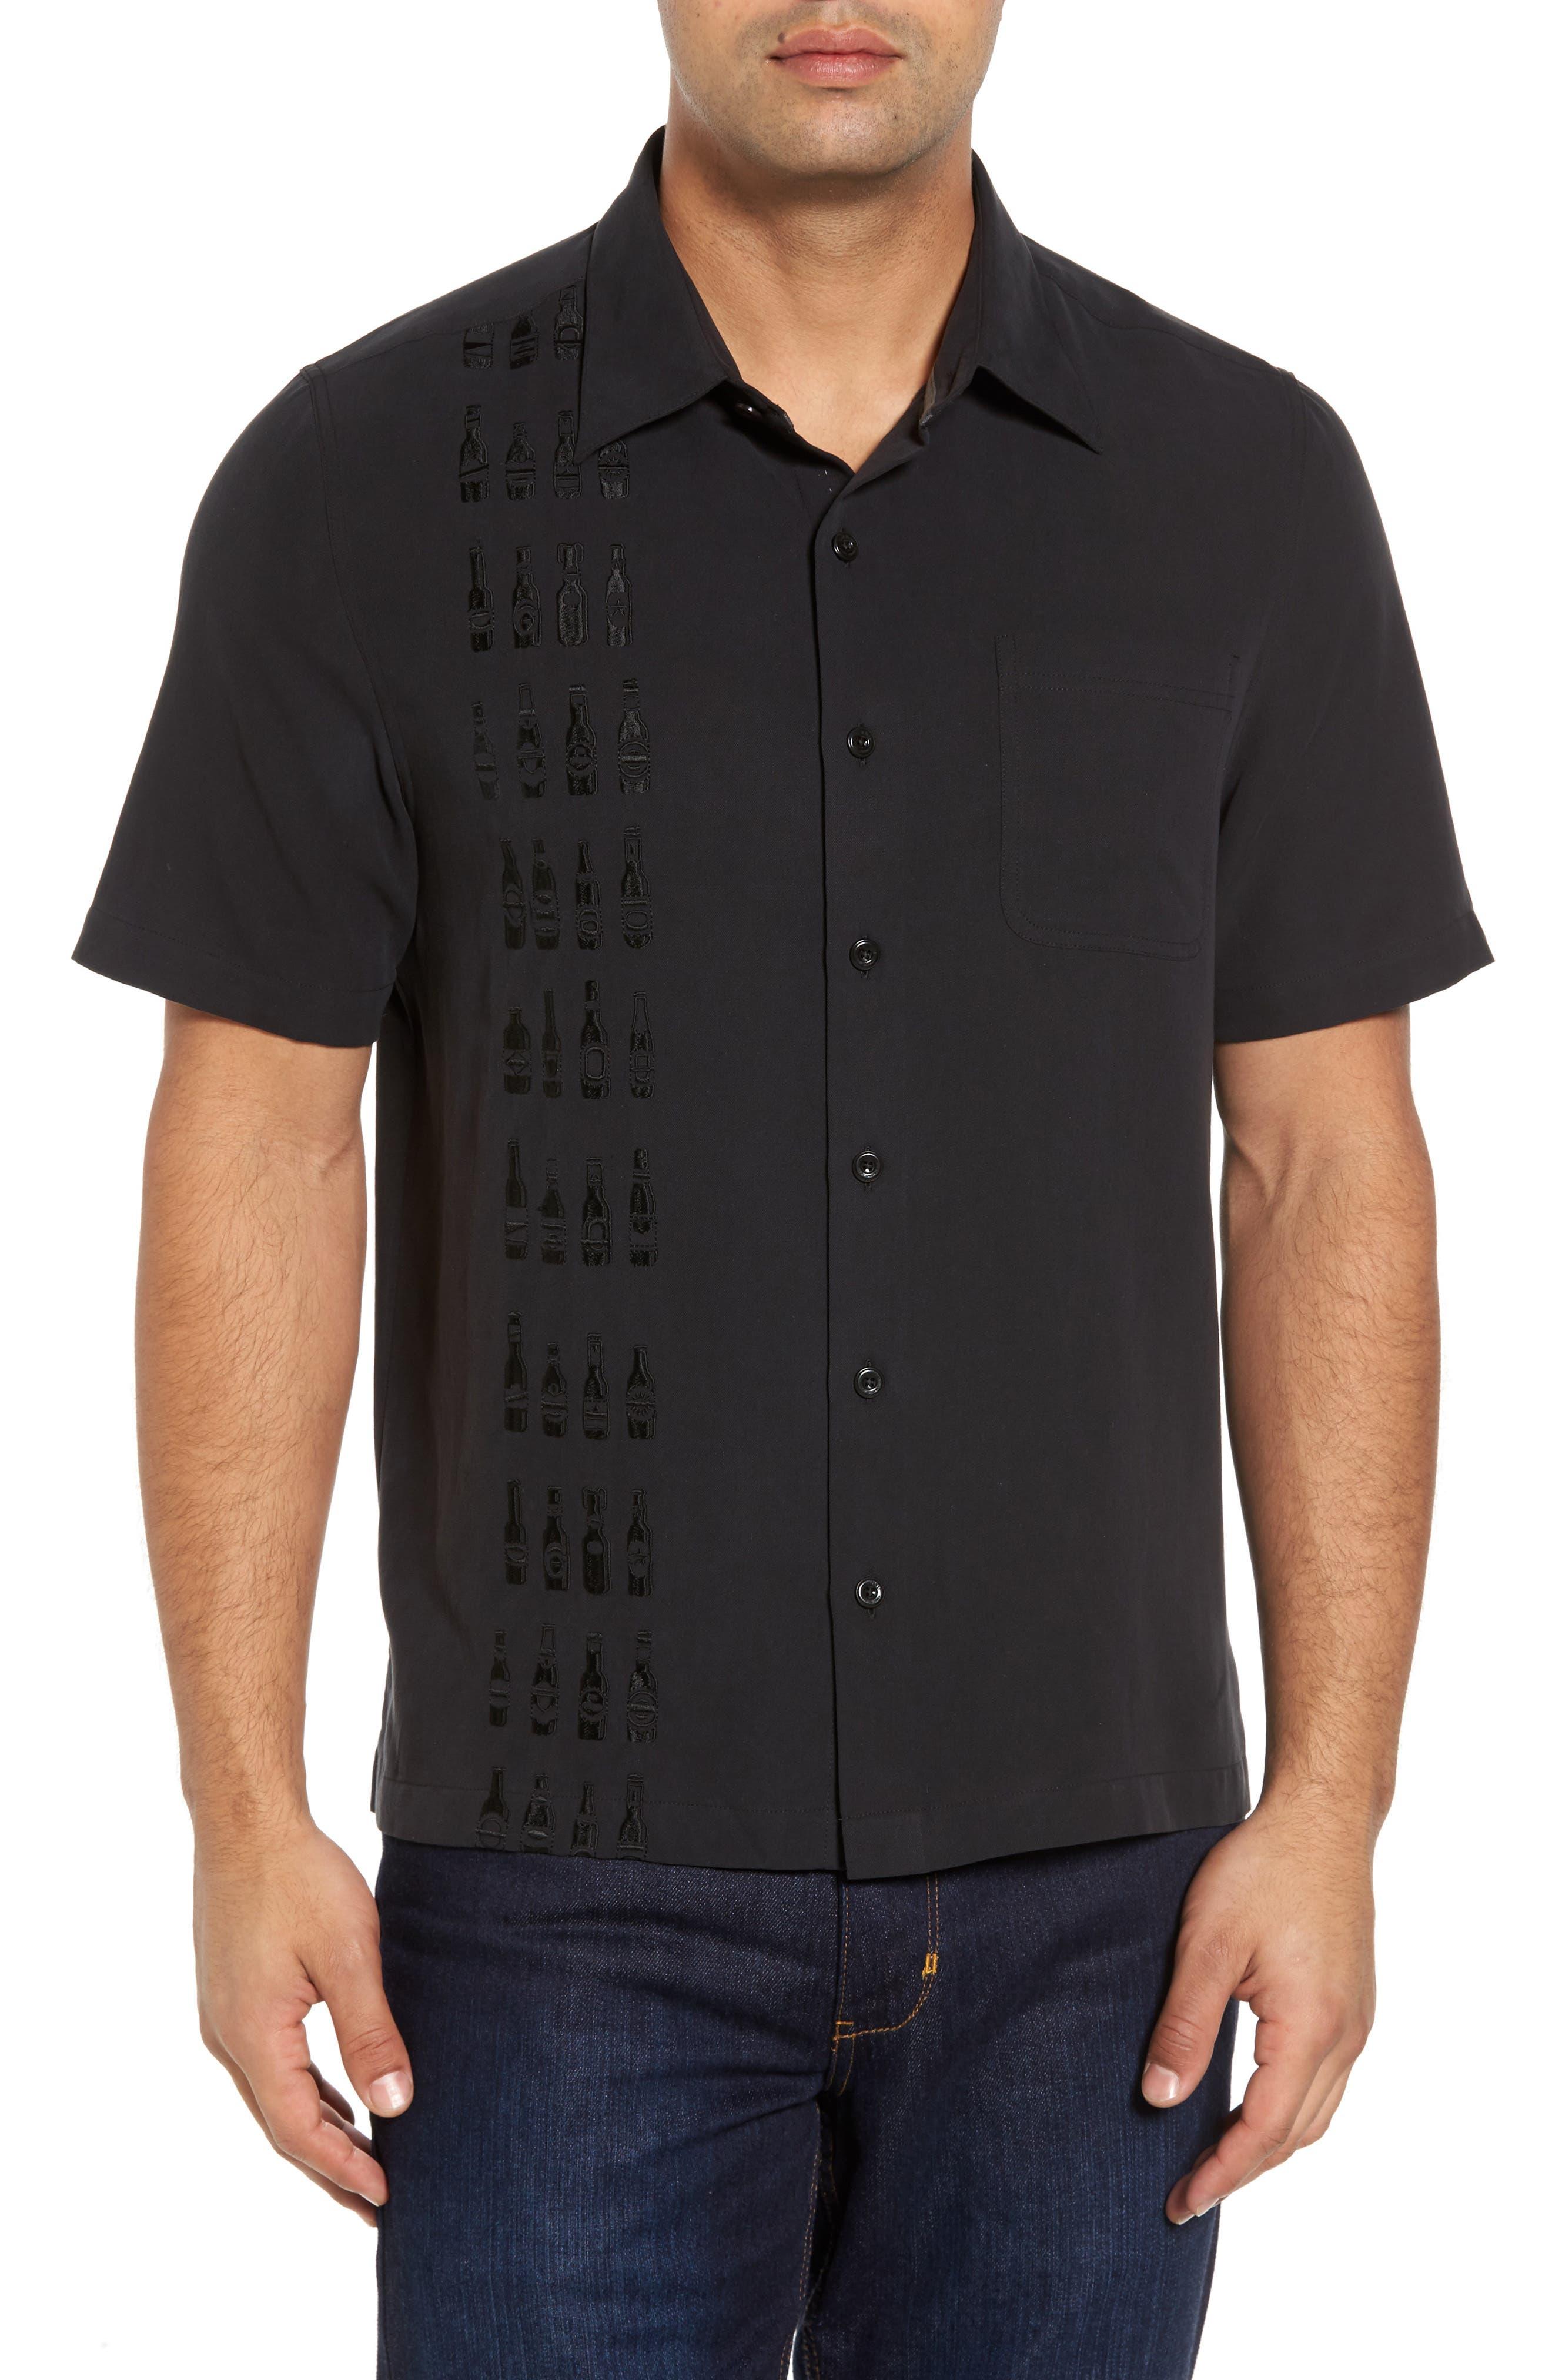 Main Image - Nat Nast Summit Regular Fit Embroidered Silk Blend Sport Shirt